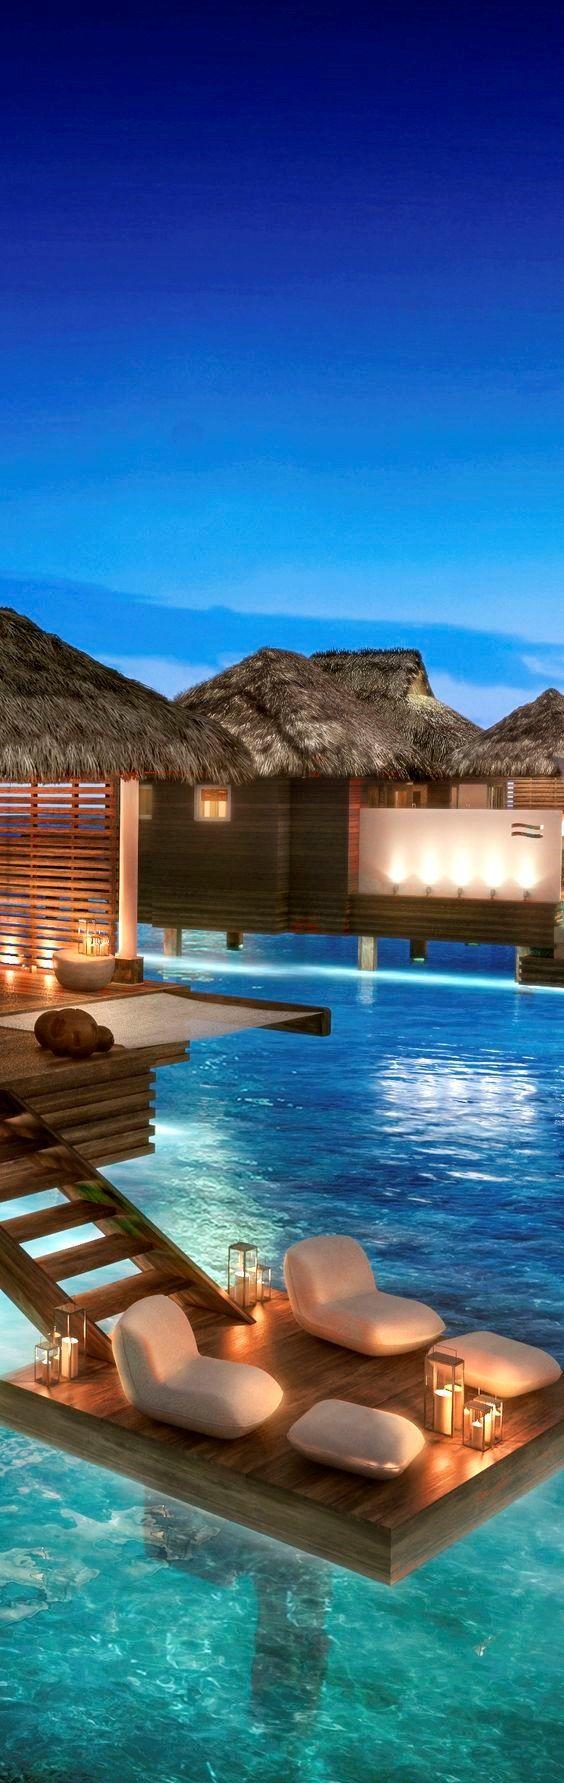 25 offbeat honeymoon destinations for 2019 | romantic destinations